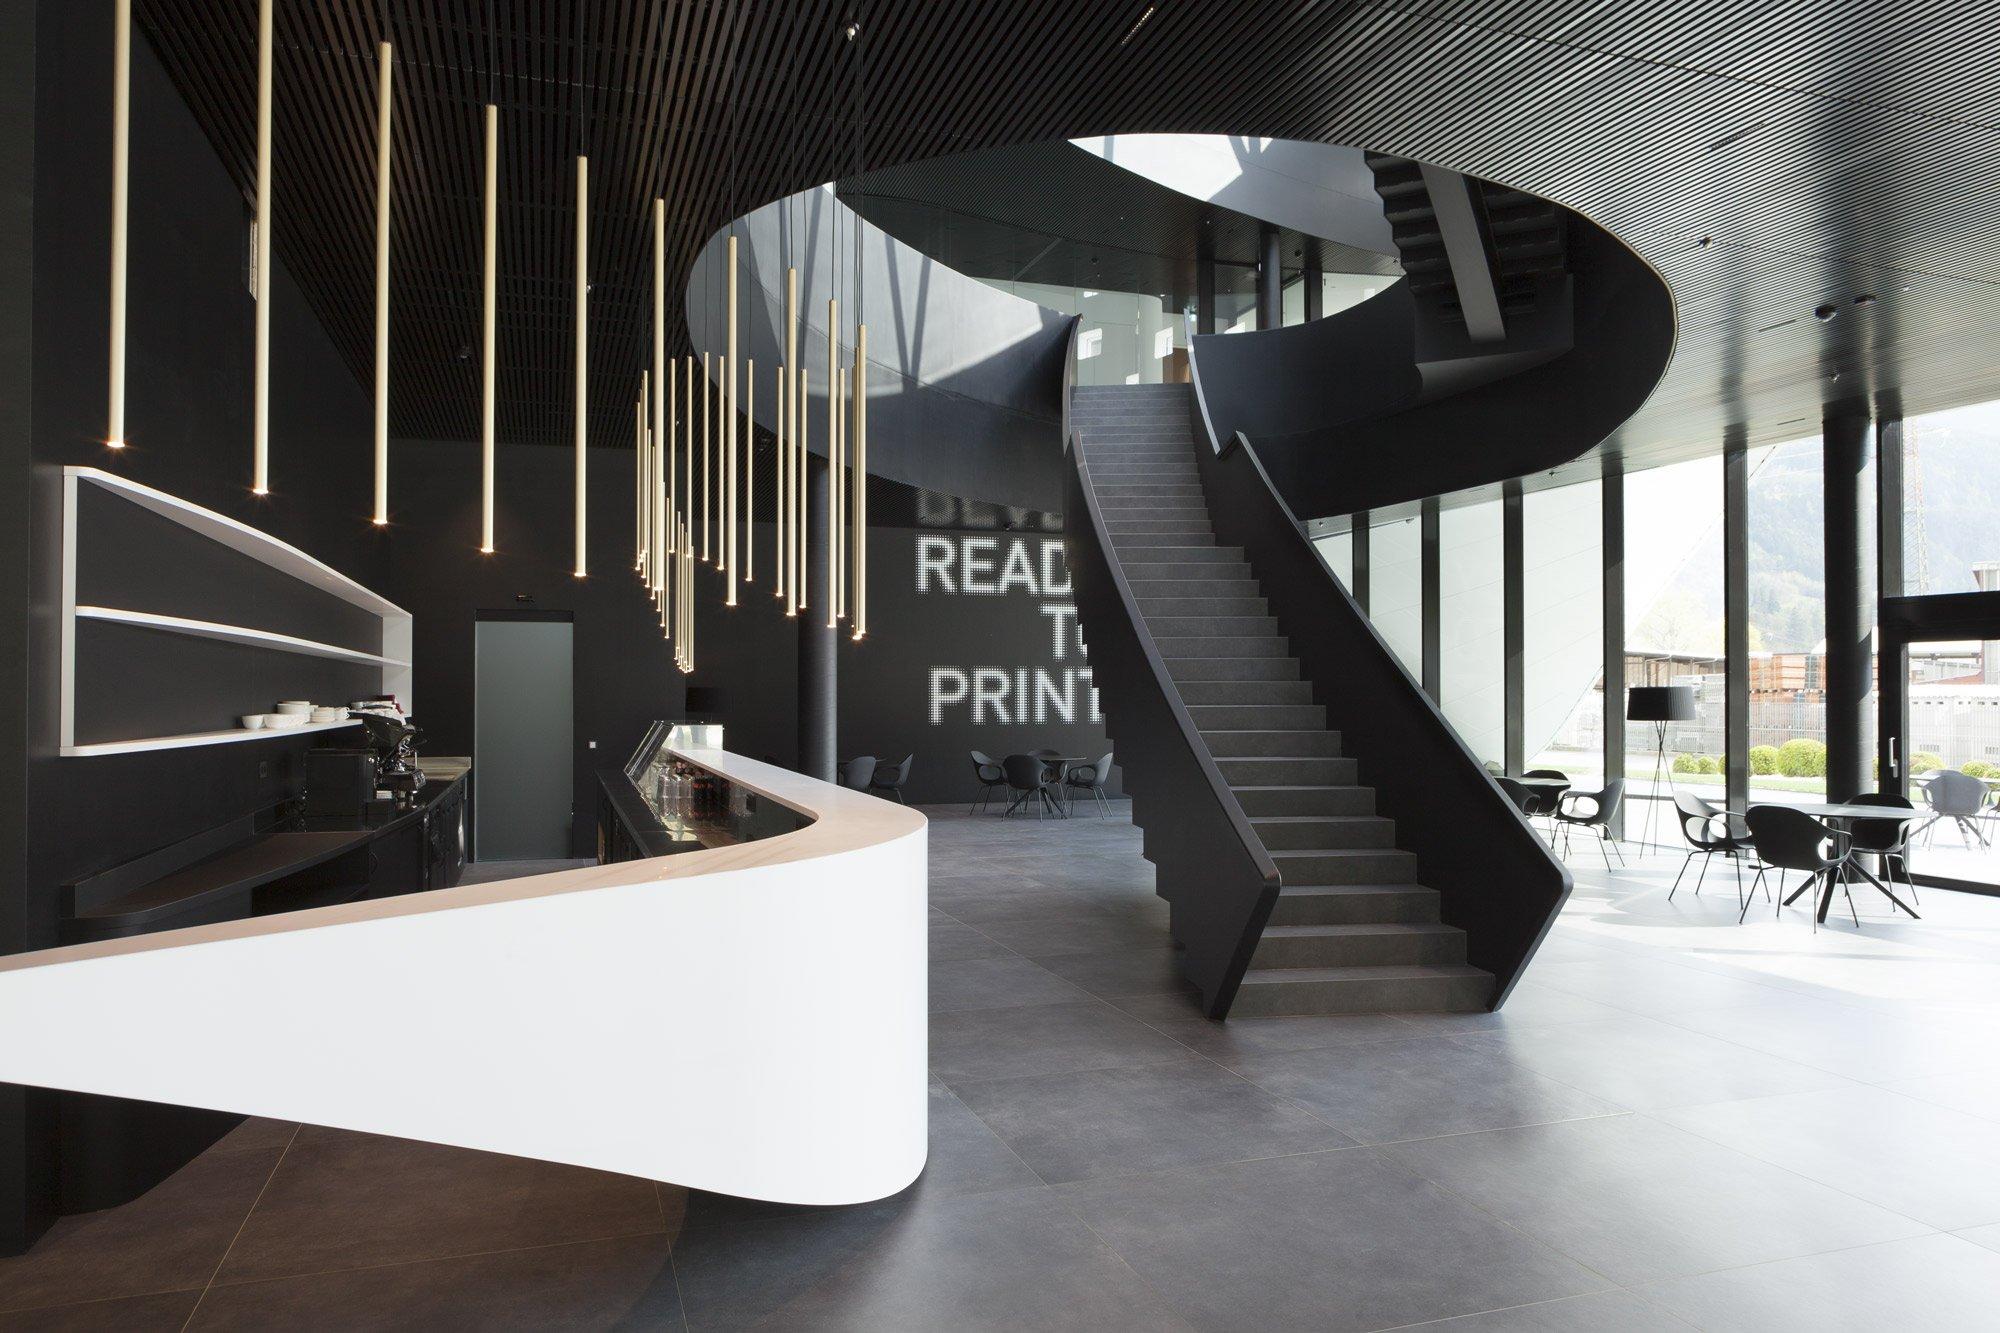 Durst Headquarters © Paolo Riolzi, courtesy Monovolume